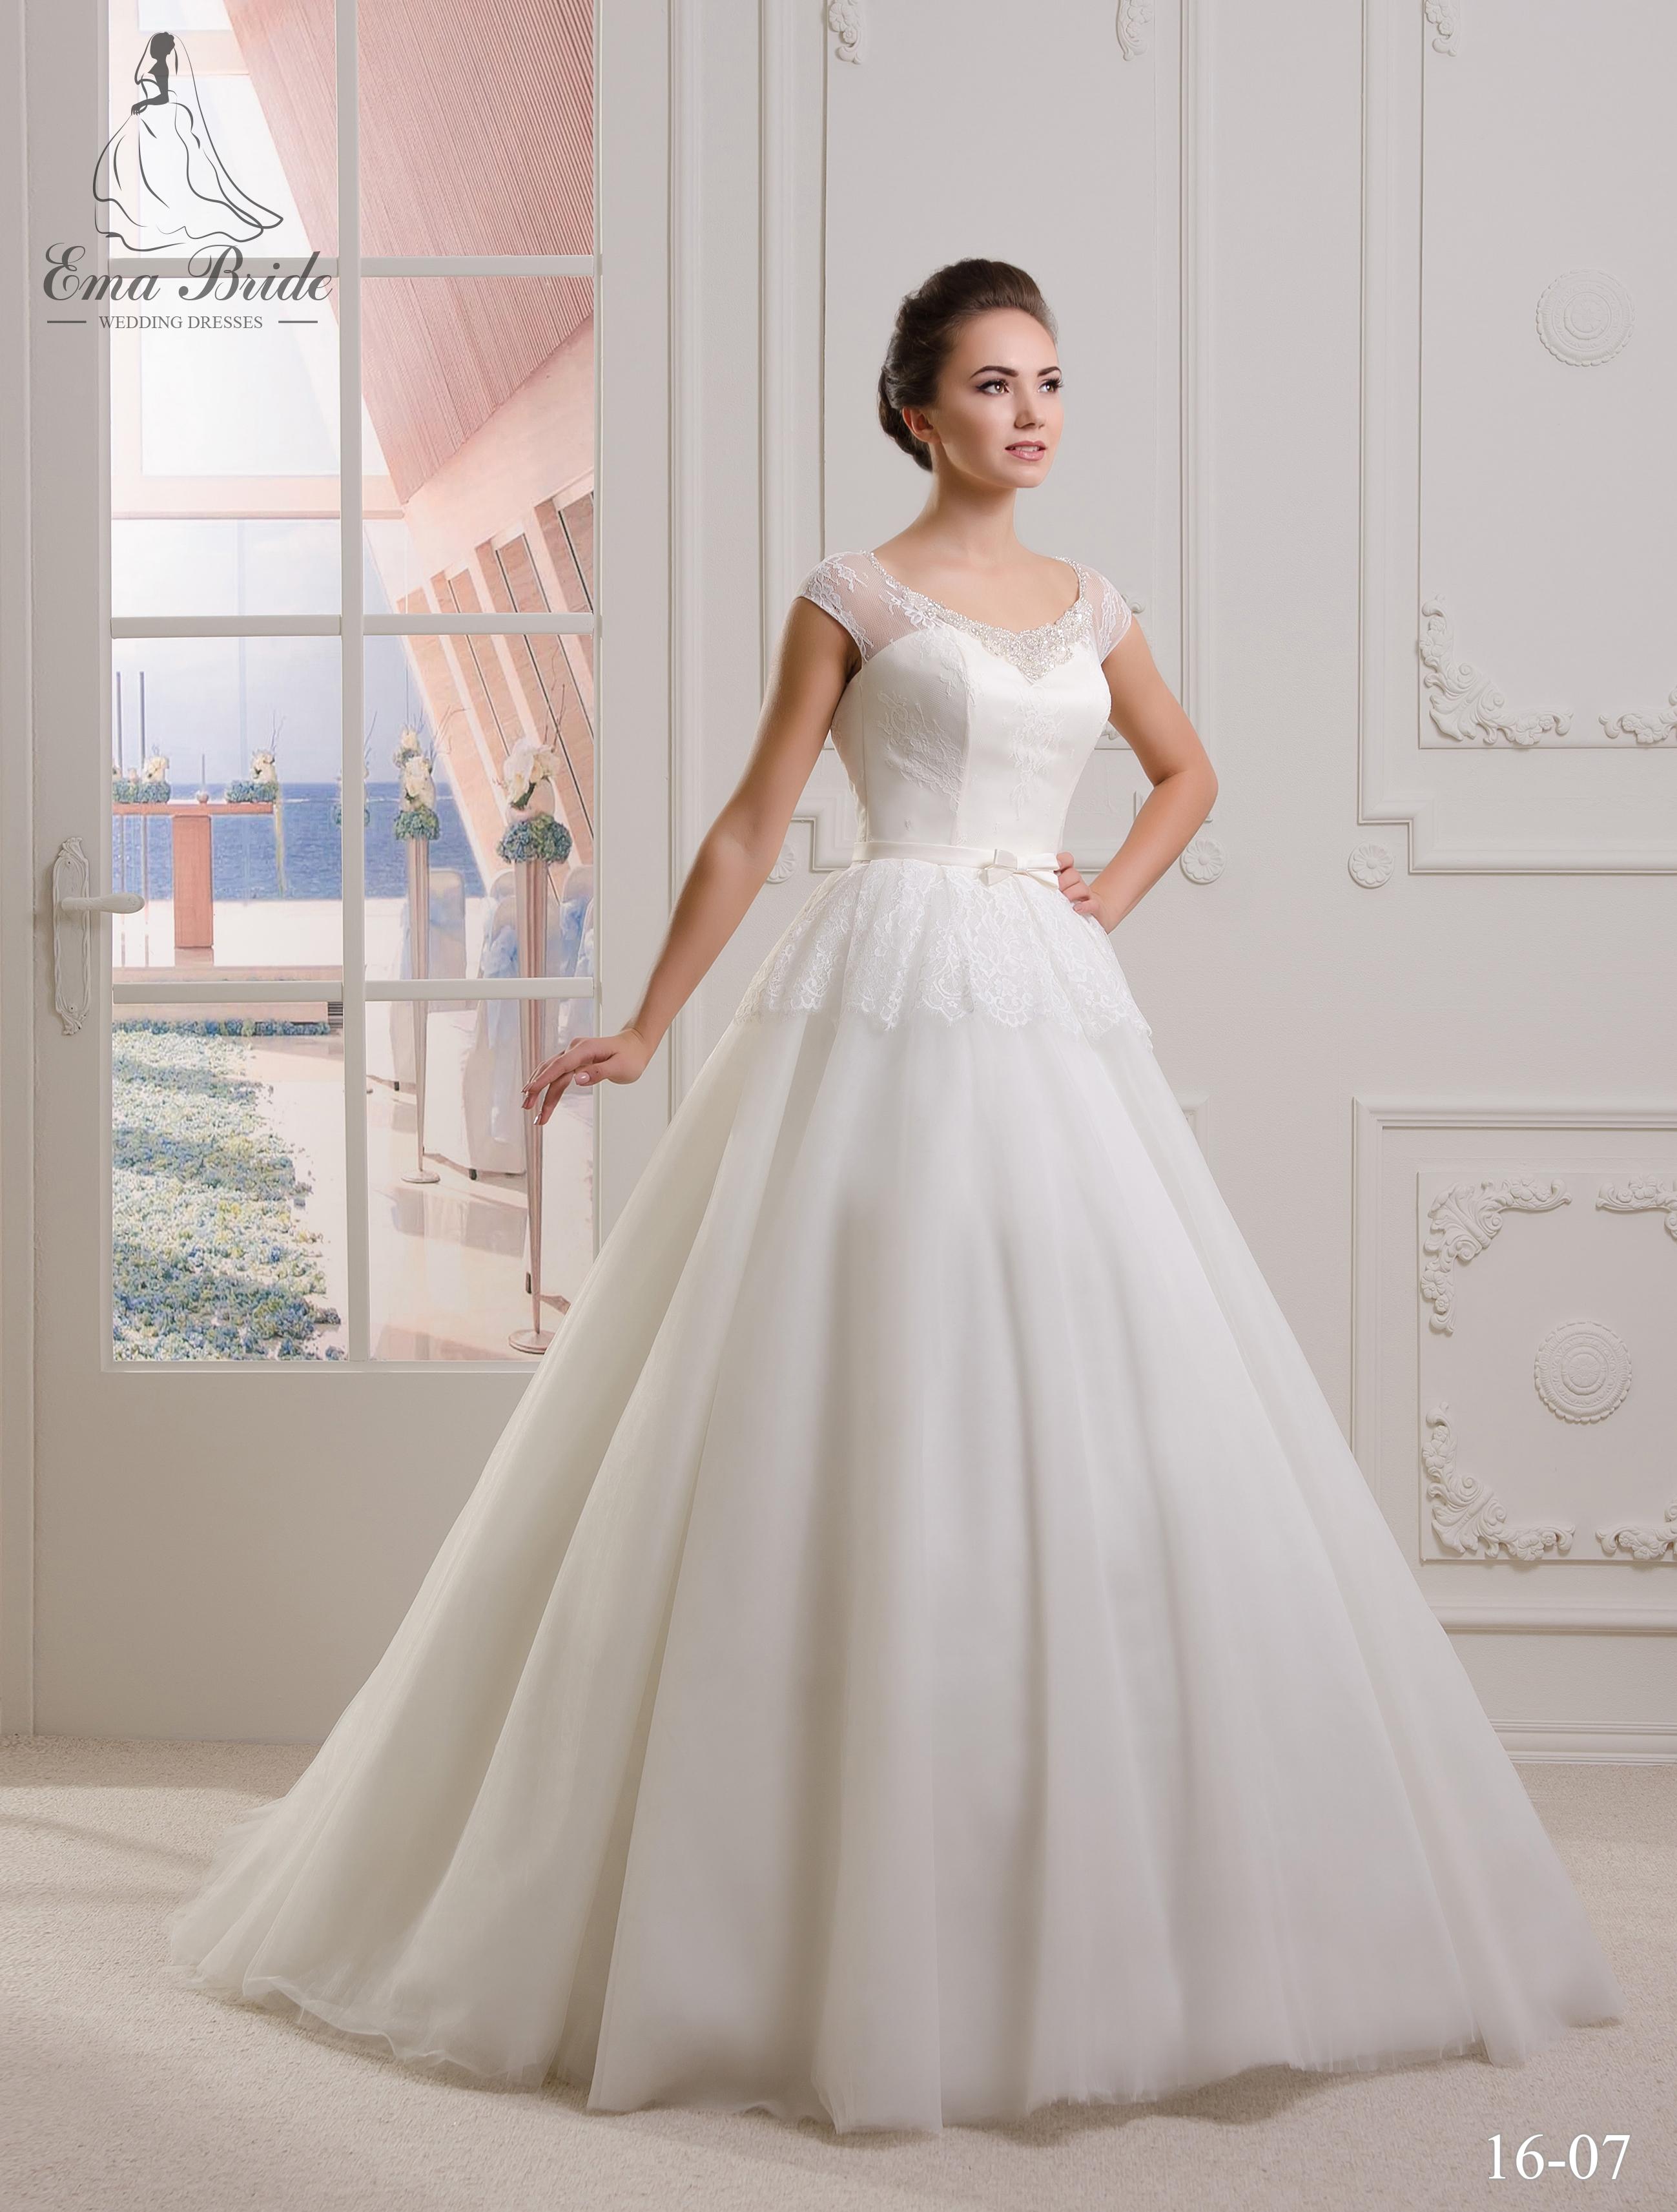 Wedding Dresses 16-07